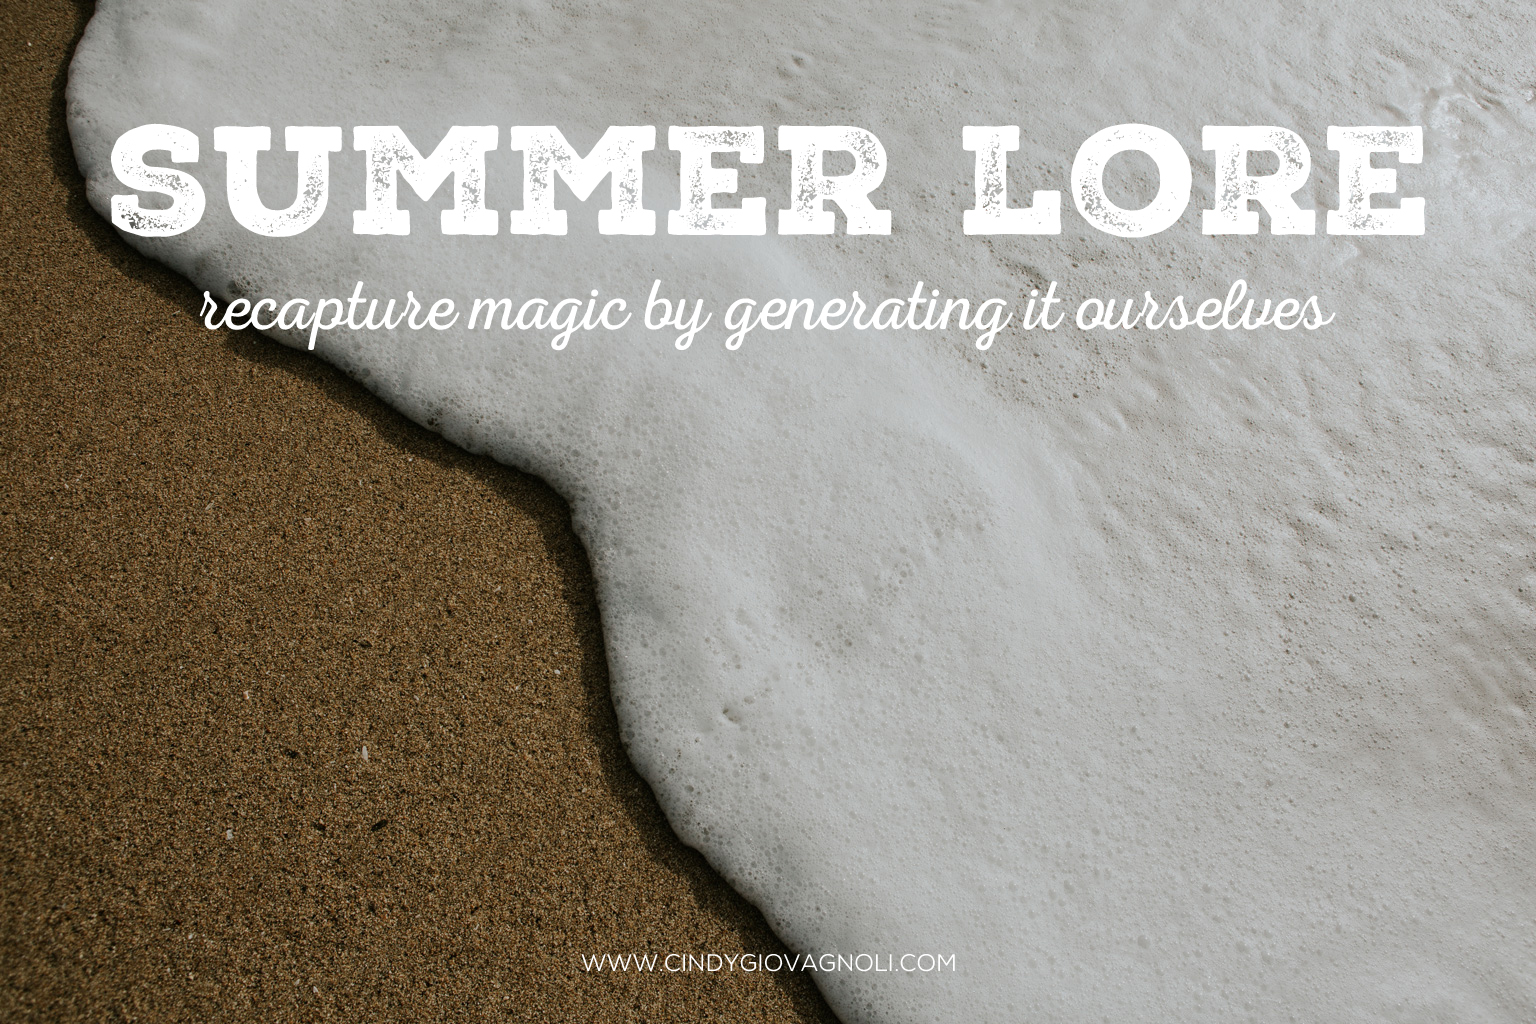 SummerLore-11-7-18.jpg